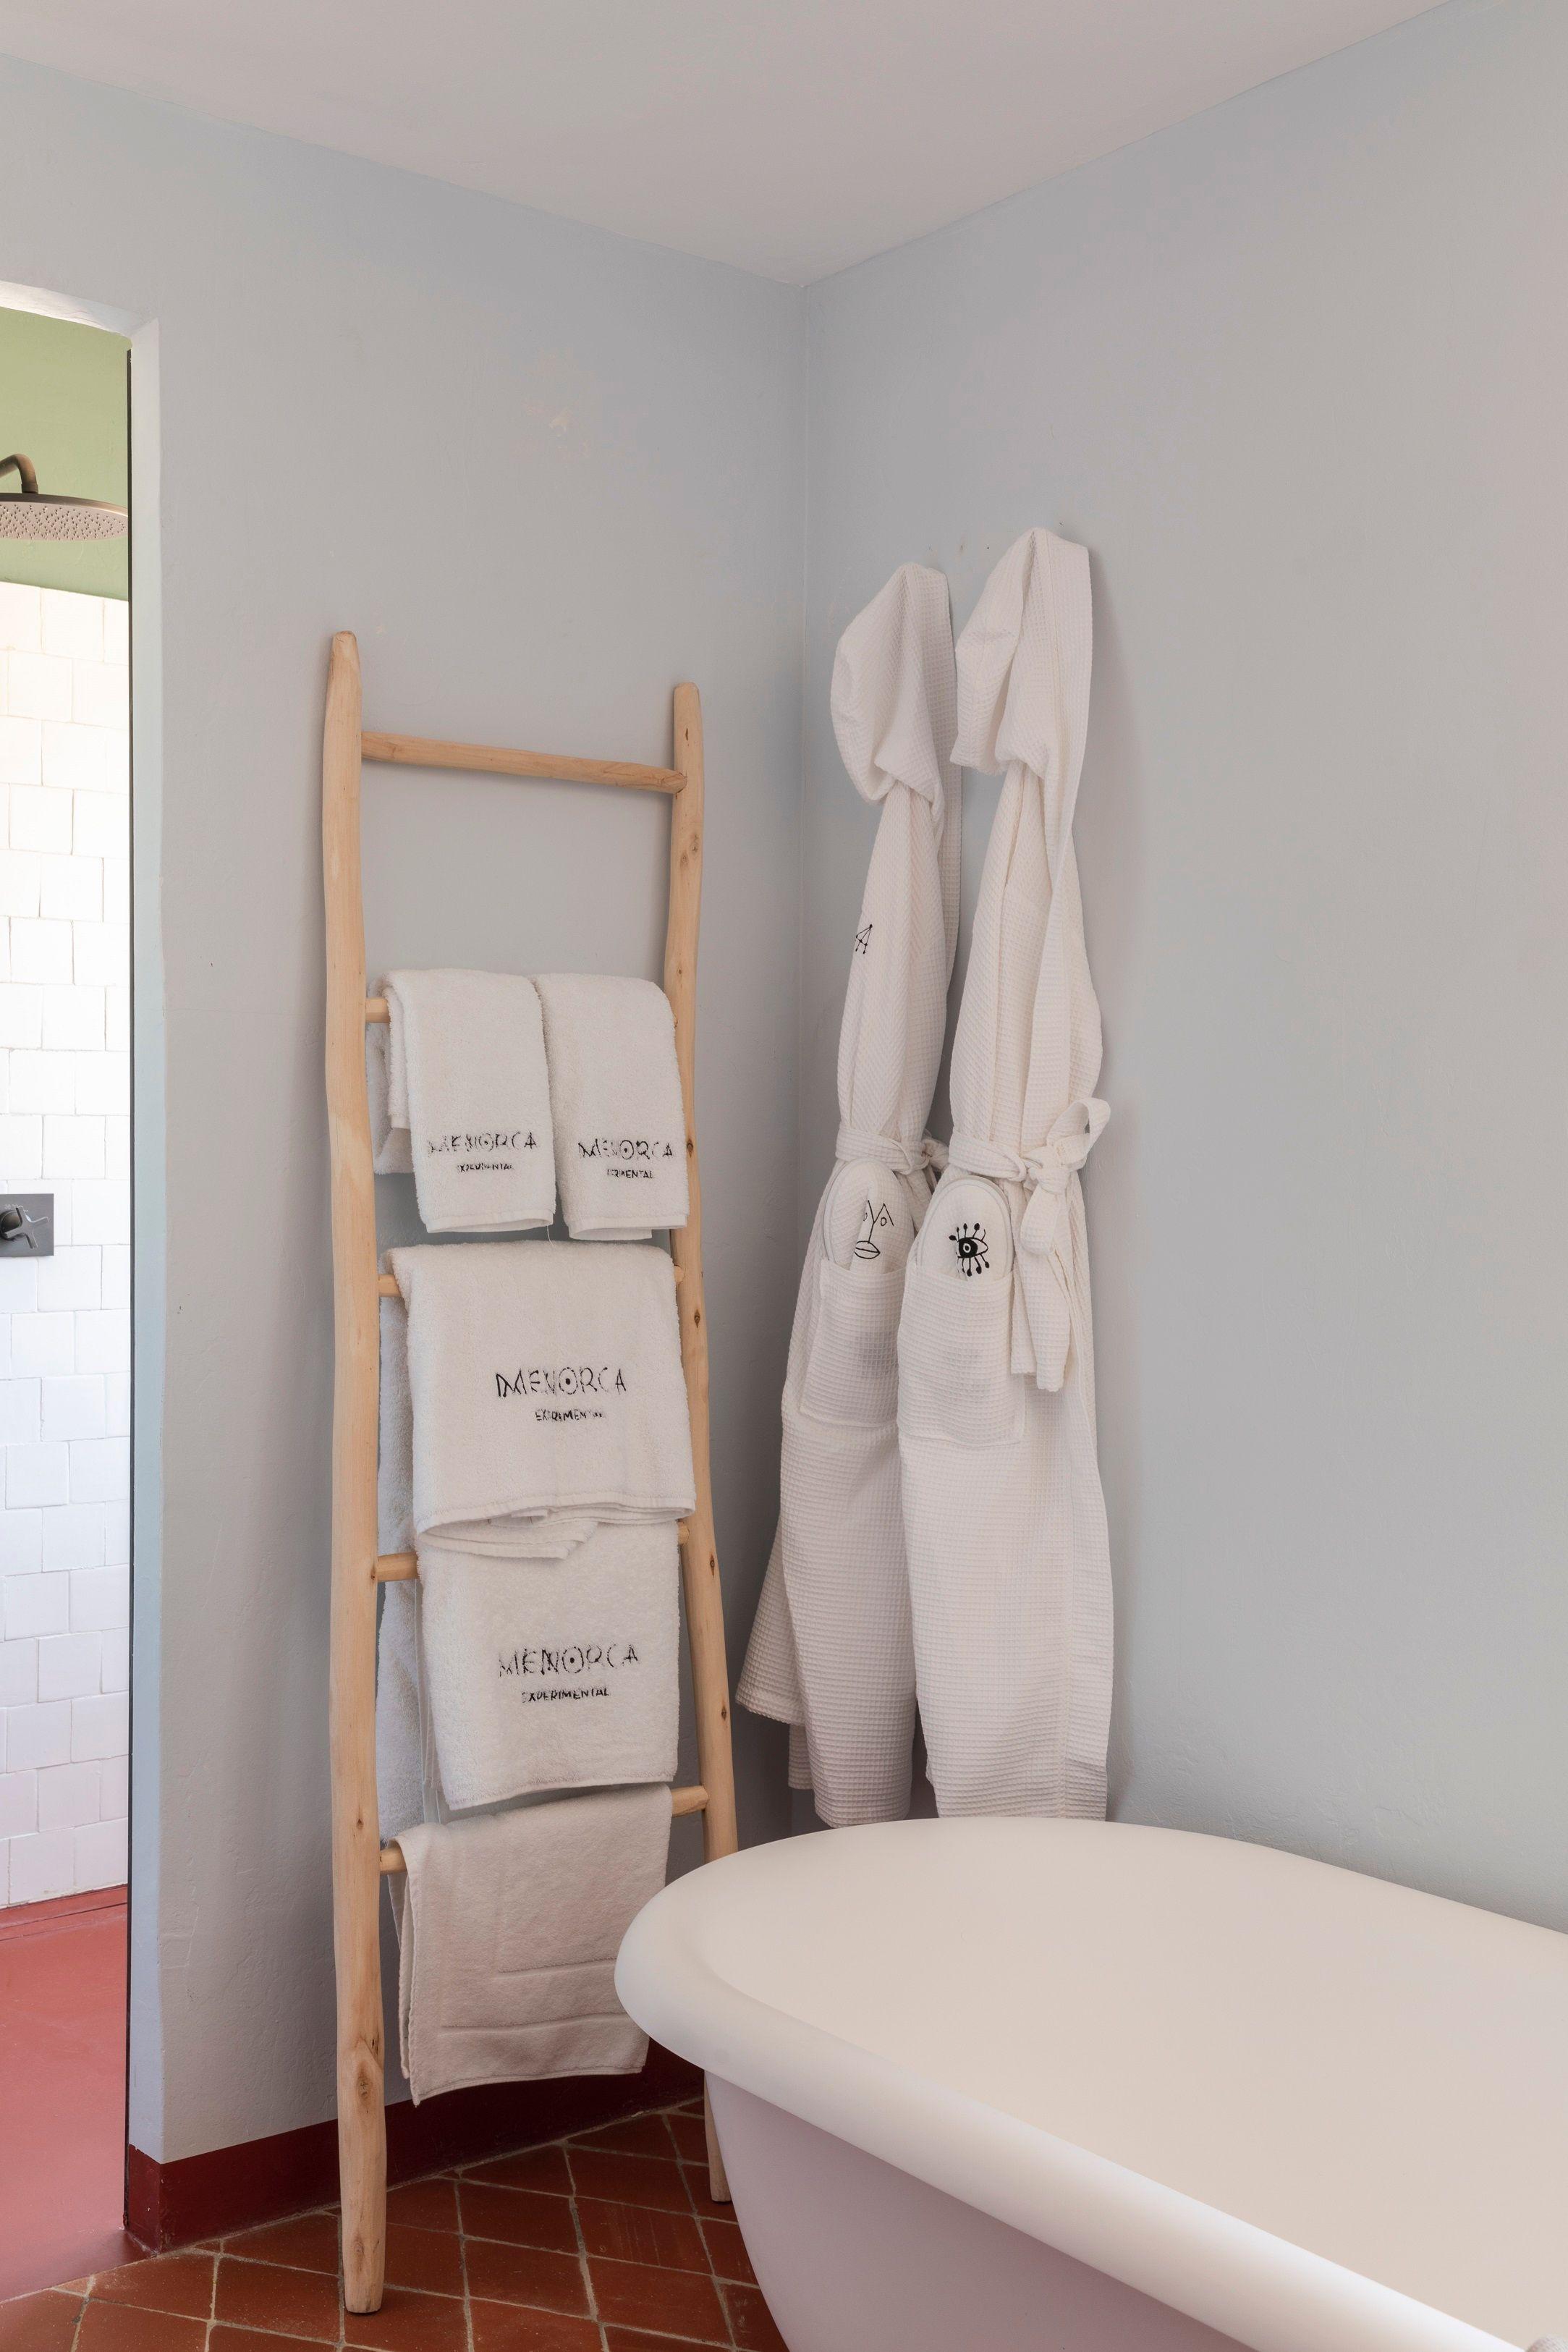 Habitación Mahon Garden 2 hotel experimental de Menorca